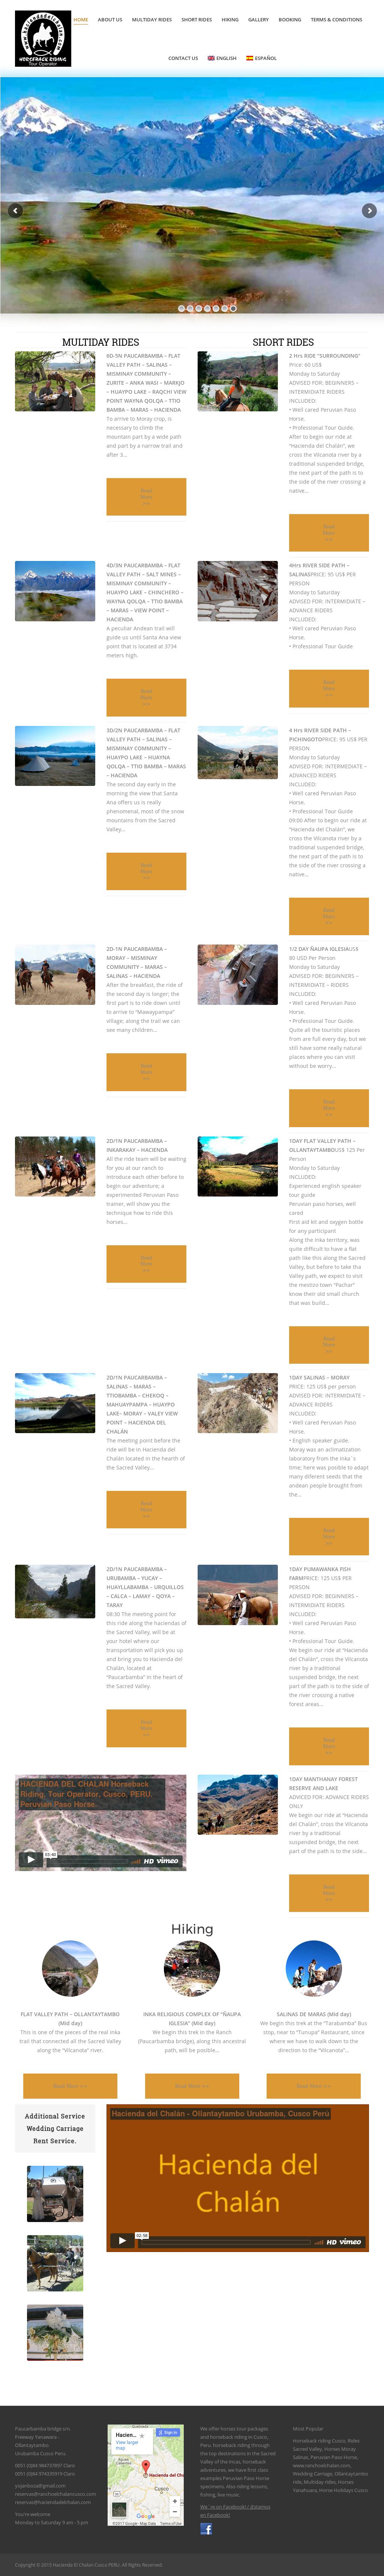 Hacienda El Chalan Cusco Peru Competitors, Revenue and